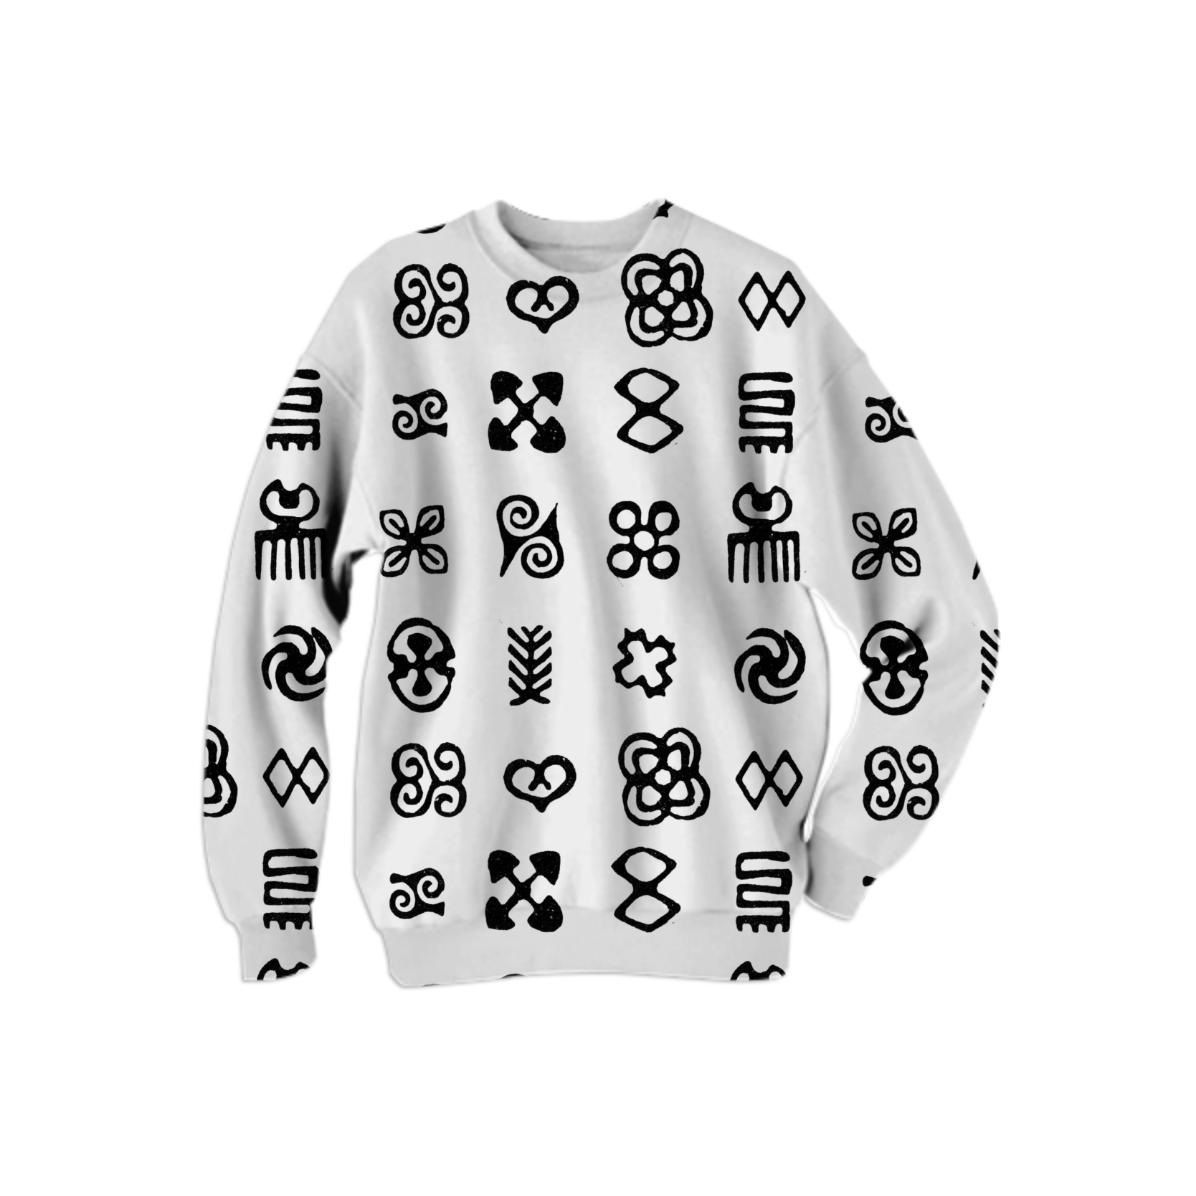 Shop Adinkra West African Symbols Cotton Sweatshirt By